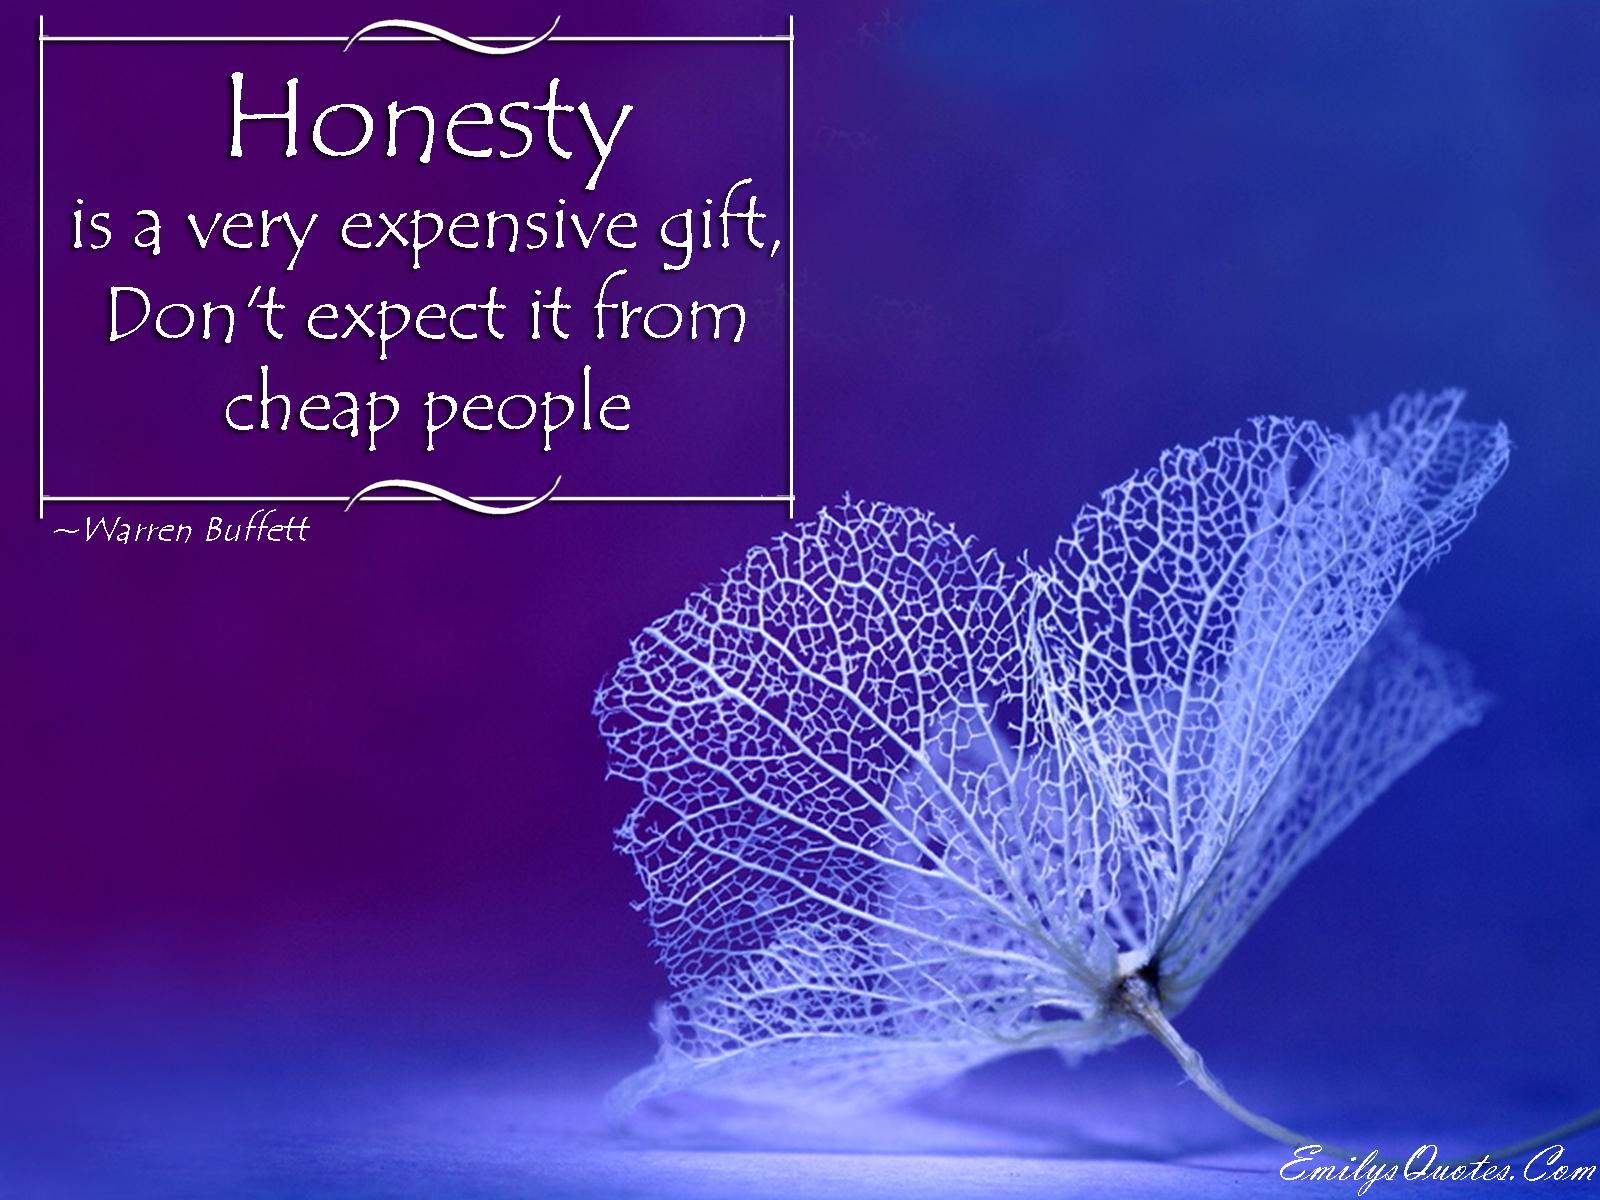 EmilysQuotes.Com - honesty, expensive, gift, cheap, people, wisdom, Warren Buffett